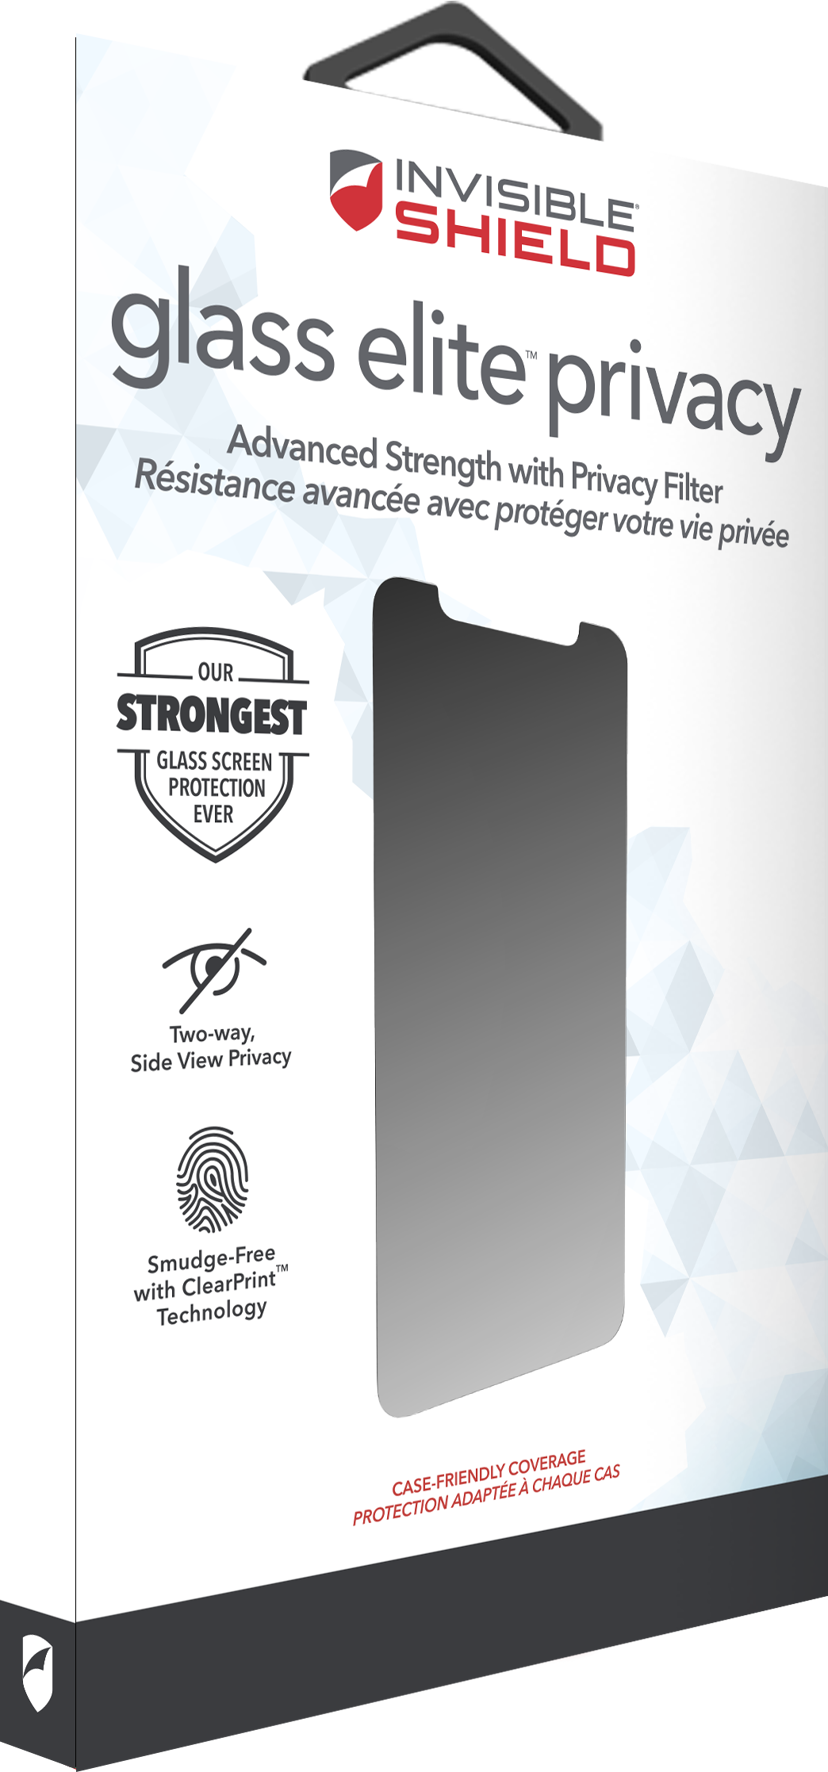 Zagg InvisibleShield Glass Elite Privacy